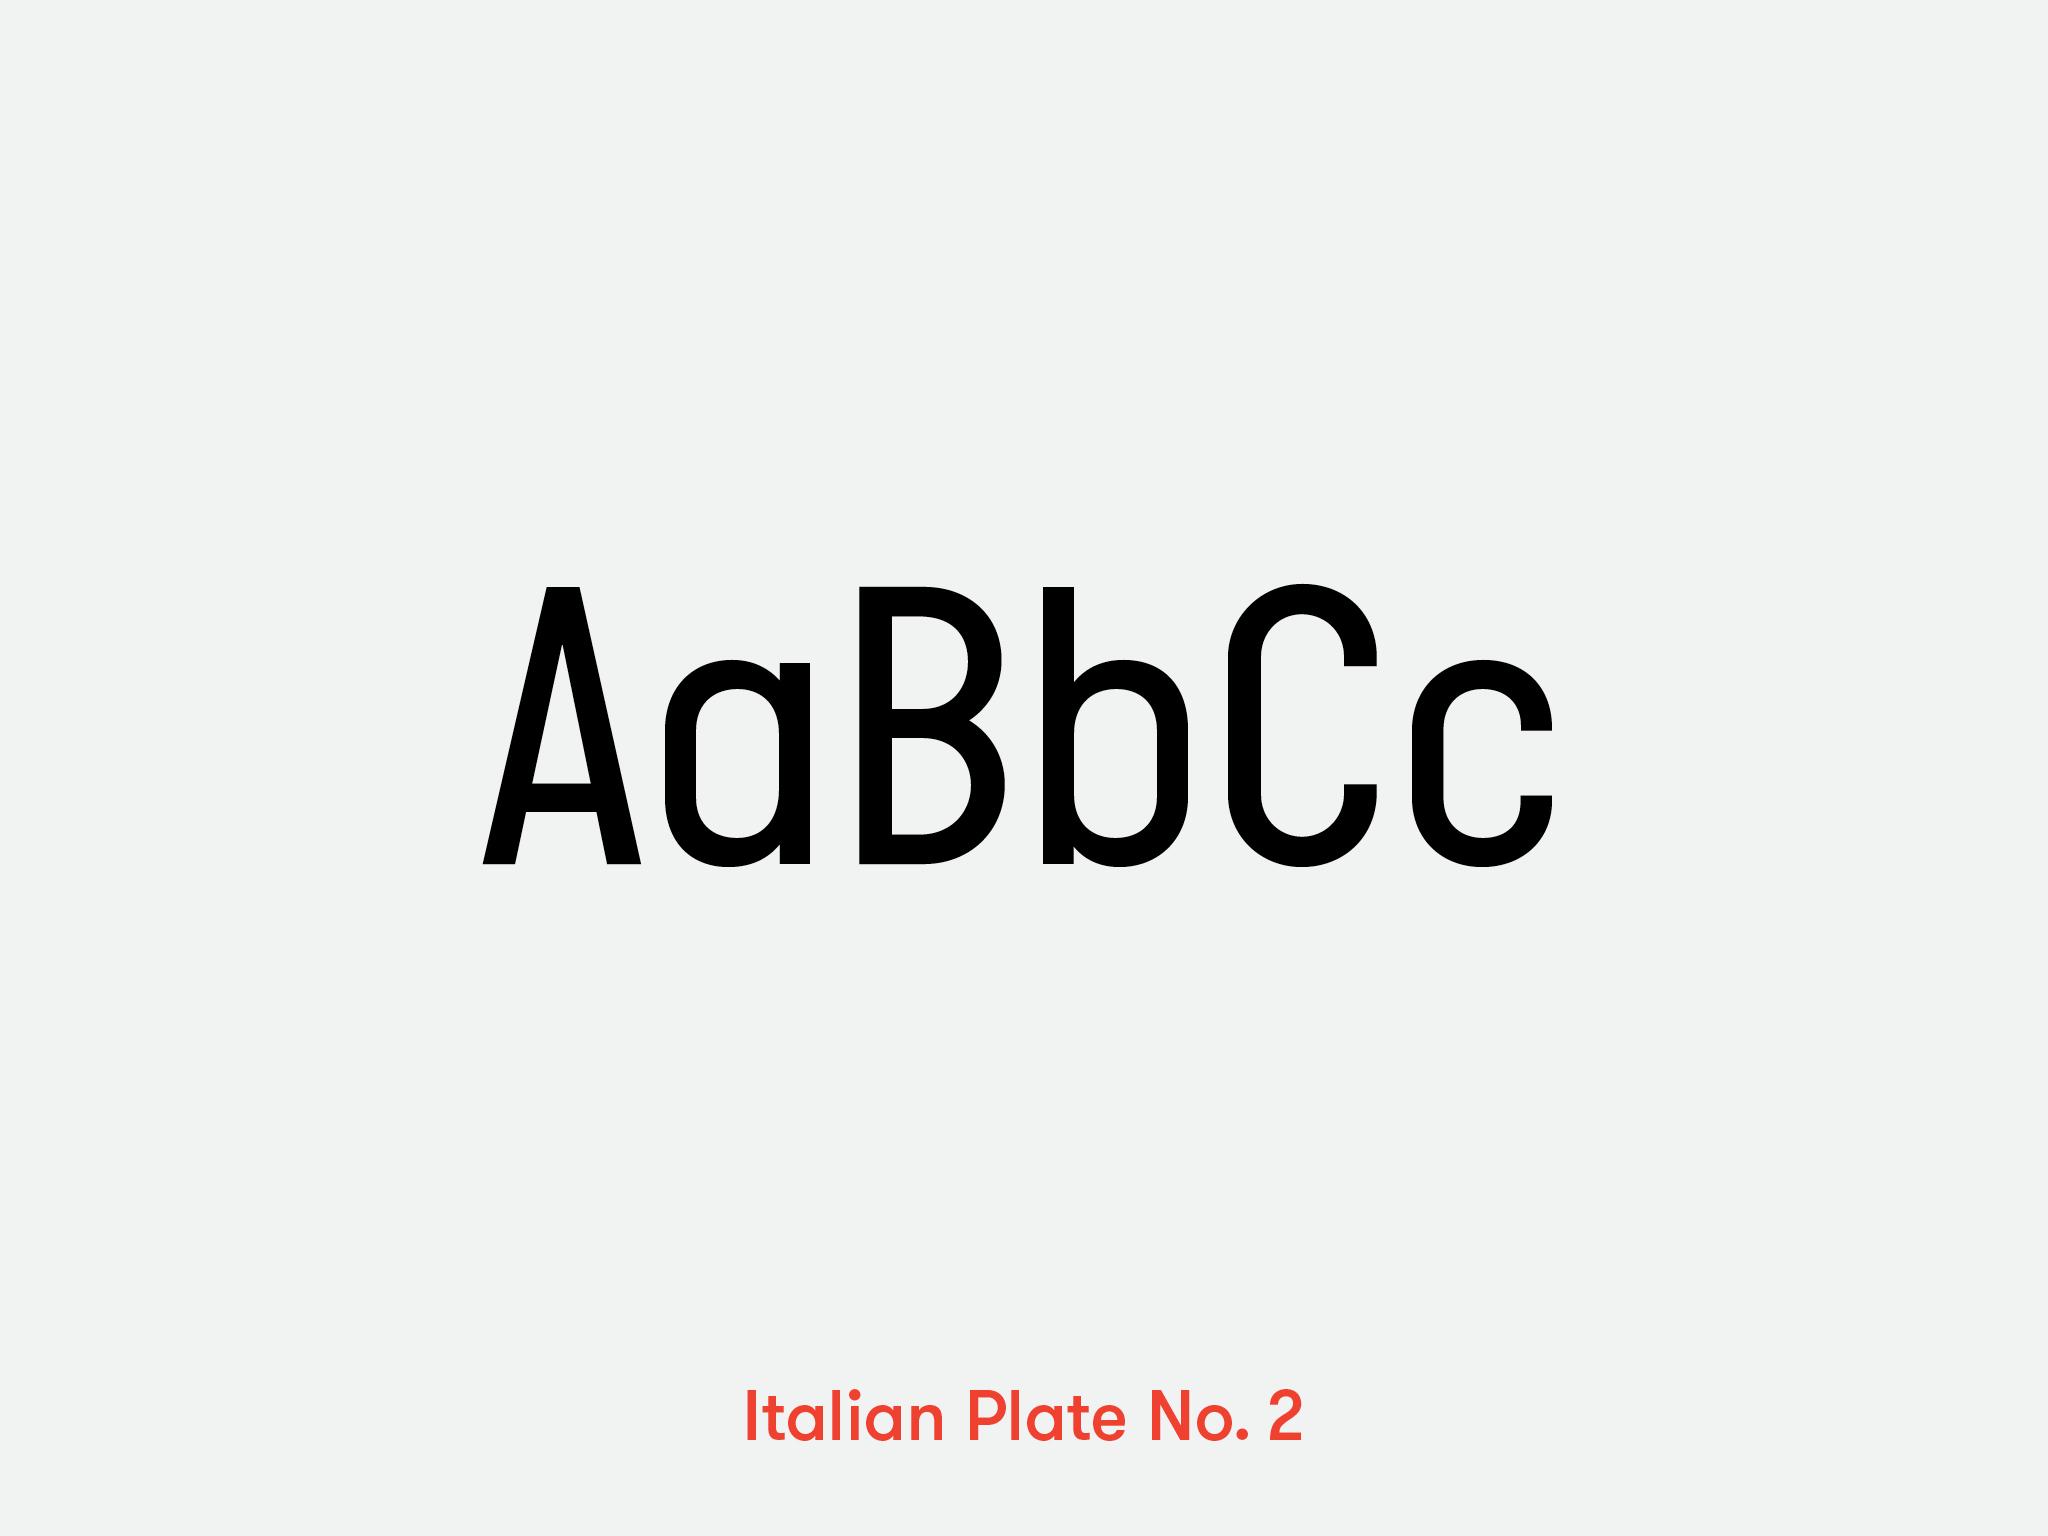 CL_CaseStudy_(4)_KB_13.jpg